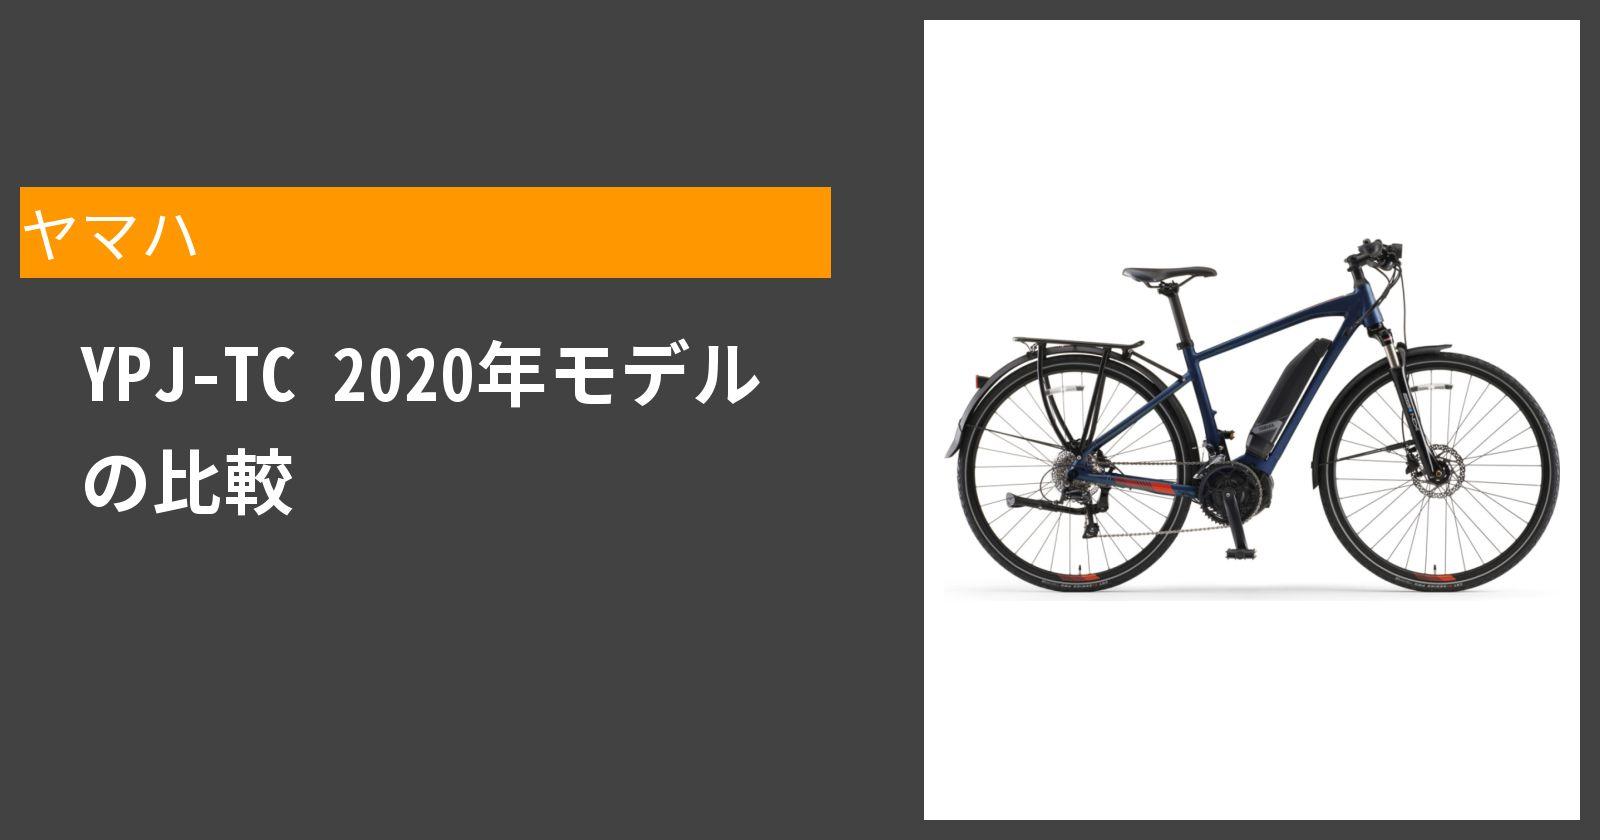 YPJ-TC 2020年モデルを徹底評価